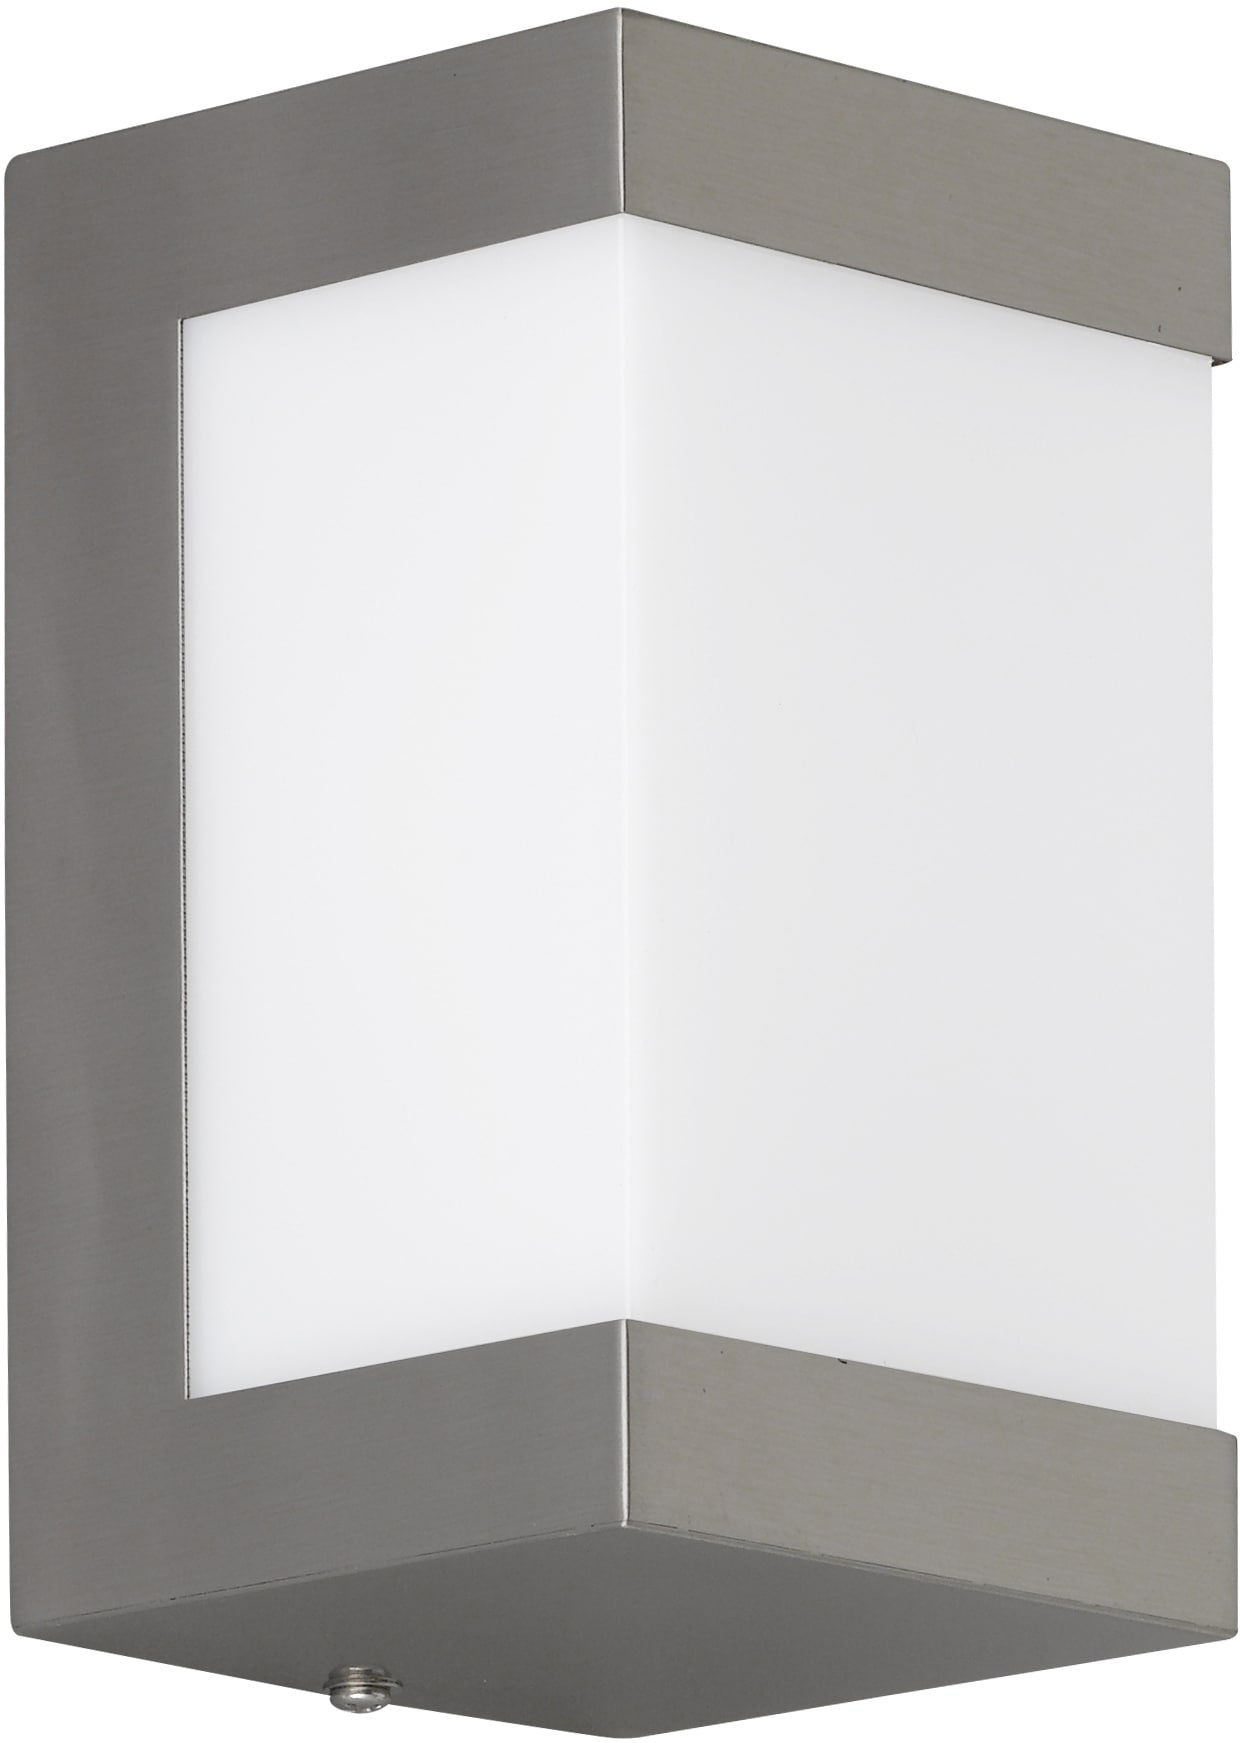 WOFI Außen-Wandleuchte CANNES, LED-Modul, Warmweiß